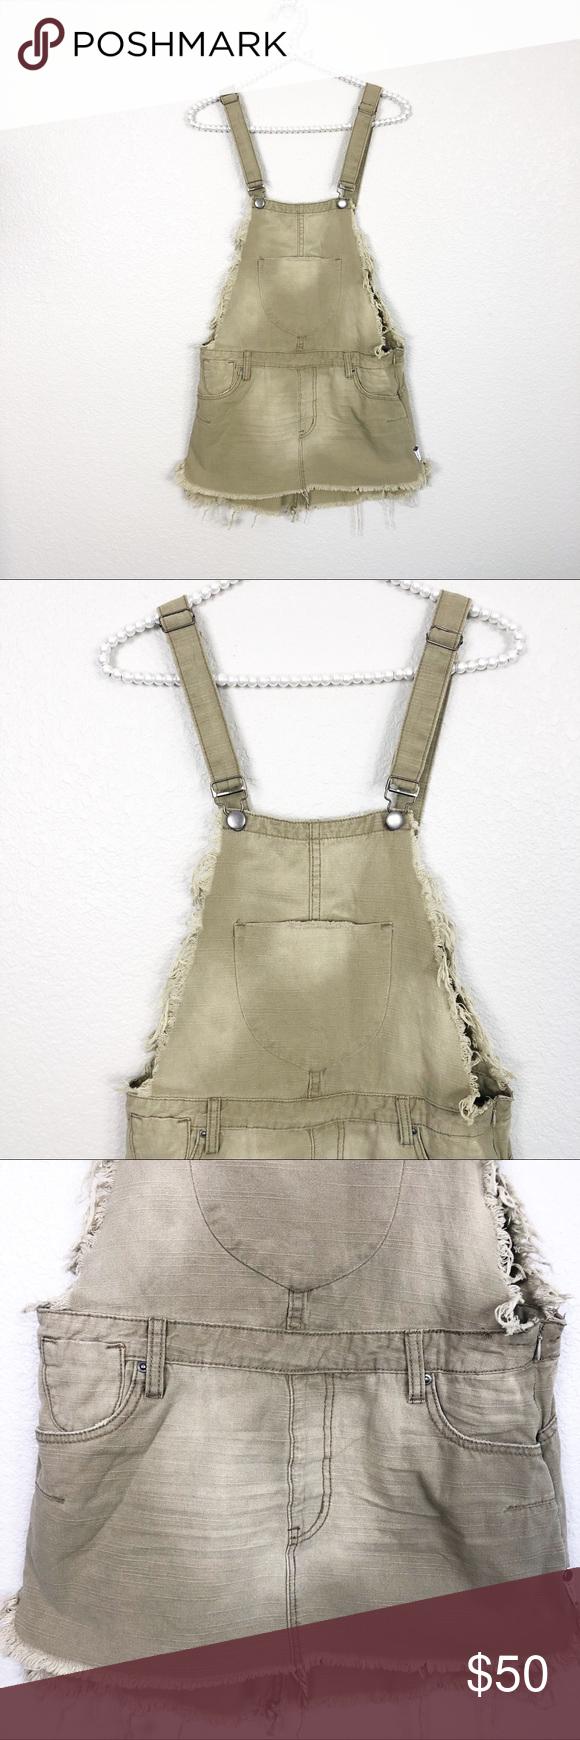 One Teaspoon Militaire Upsized Pini Dress Sz S Oneteaspoon Overall Dress Clothes Design [ 1740 x 580 Pixel ]